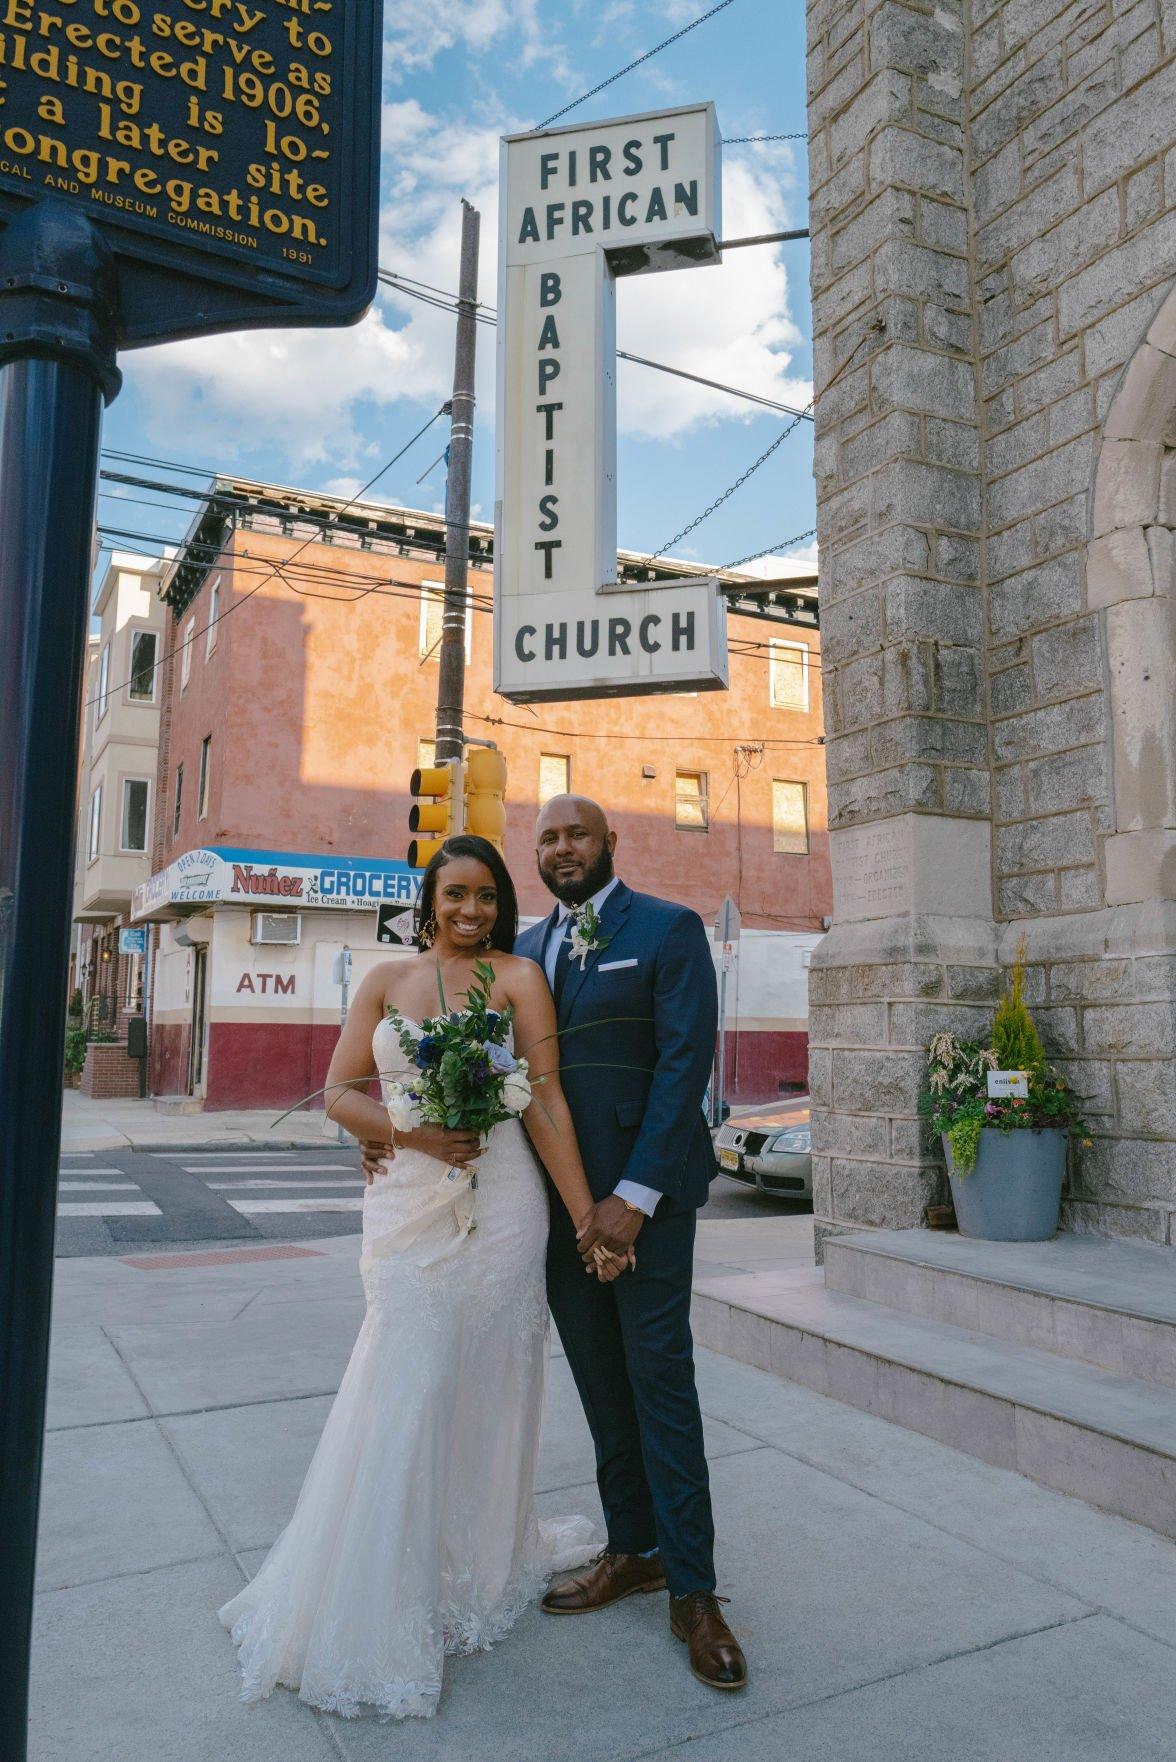 lif-wedding062721-02.jpg